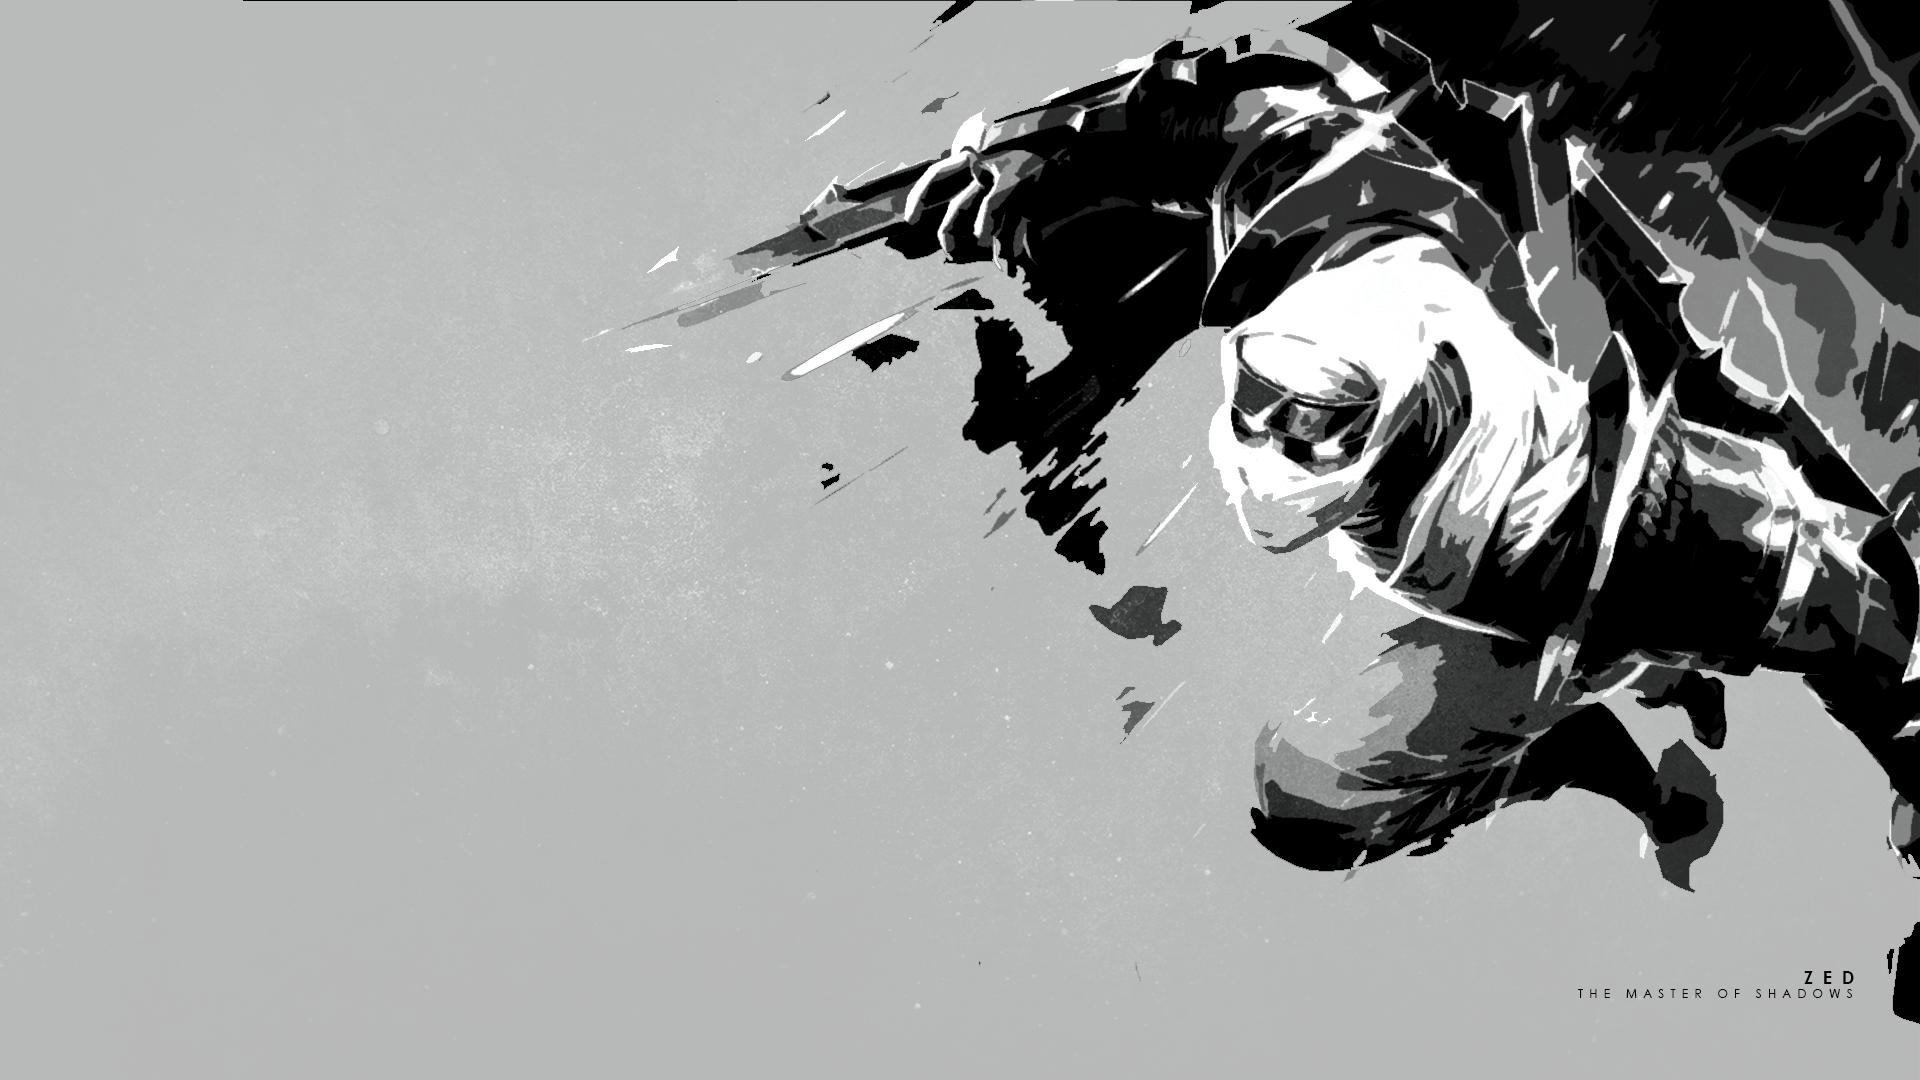 Shockblade Zed Minimalistic - LoLWallpapers